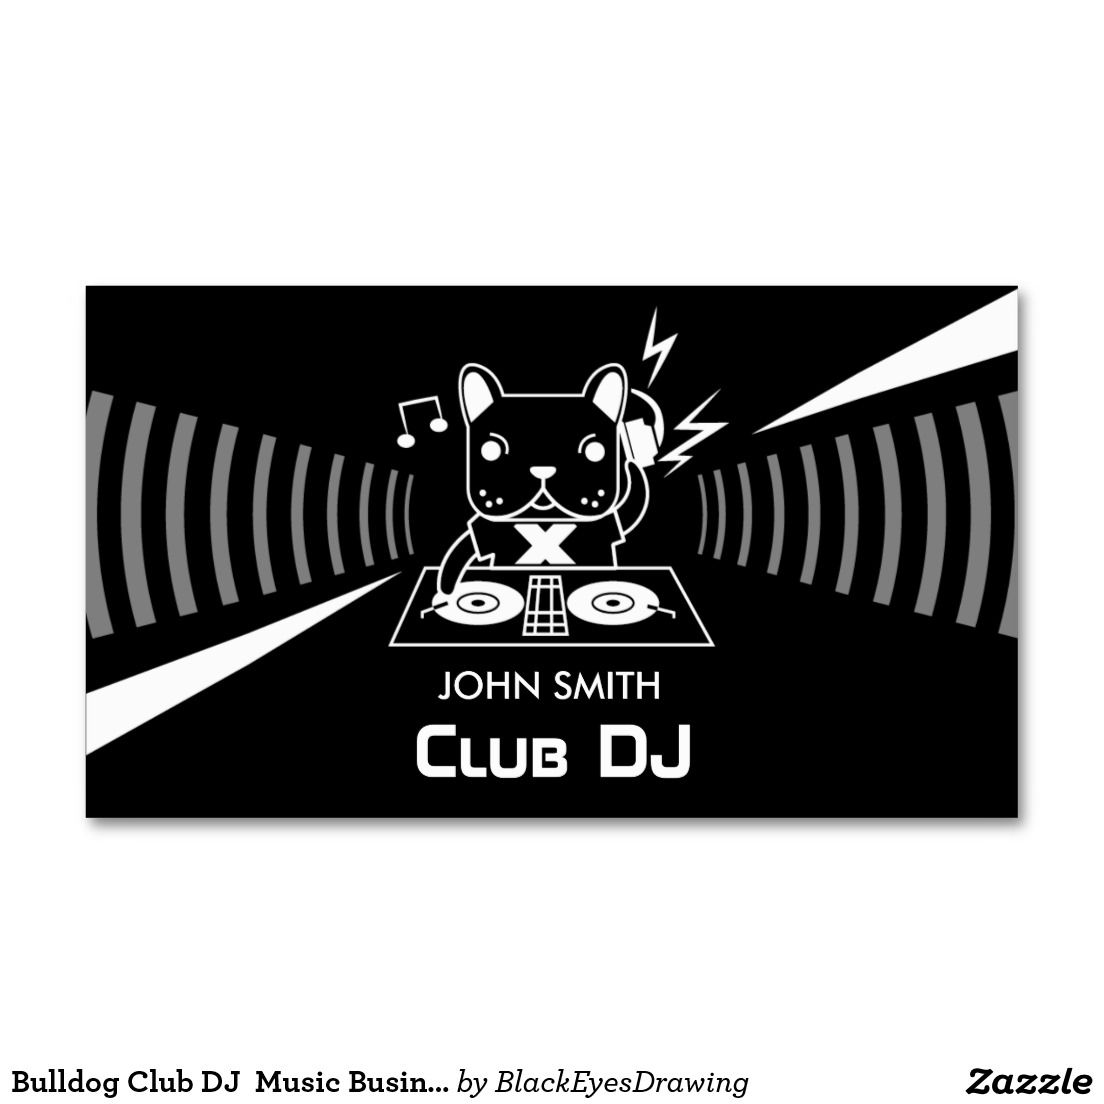 Bulldog club dj music business cards dj music business cards and bulldog club dj music business cards reheart Image collections